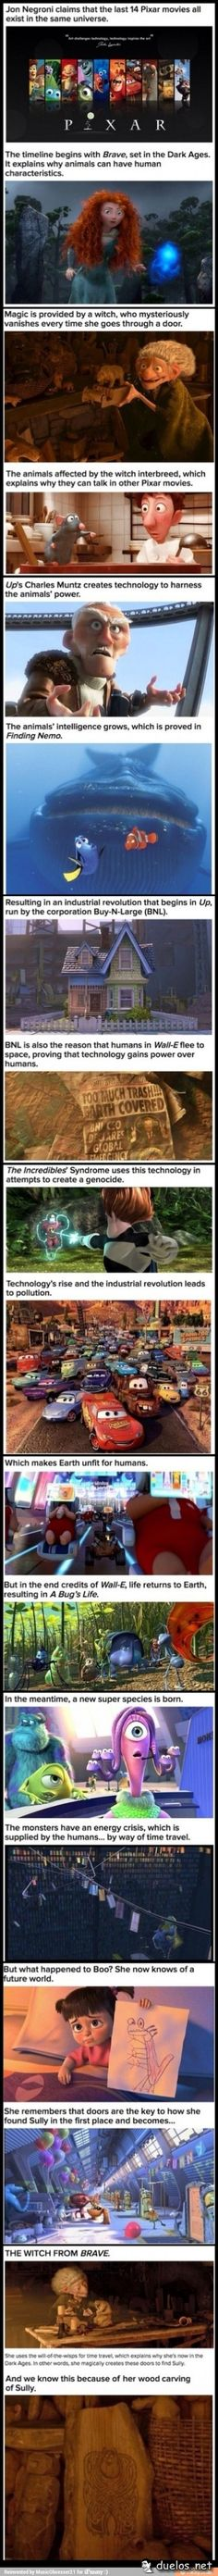 Pixar Hypothesis - I think my brain hurts...